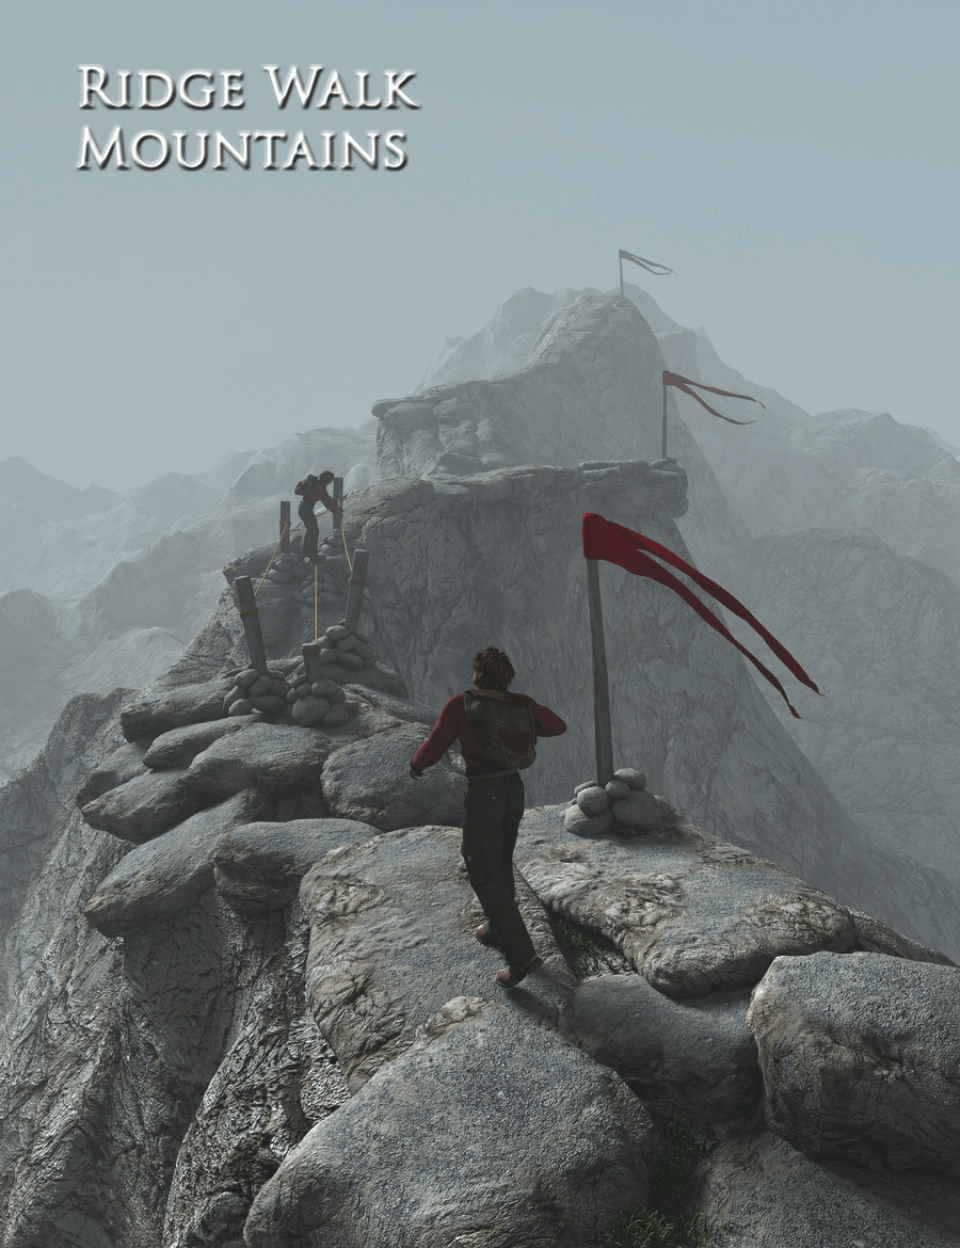 daz ridge walk mountains showing flags